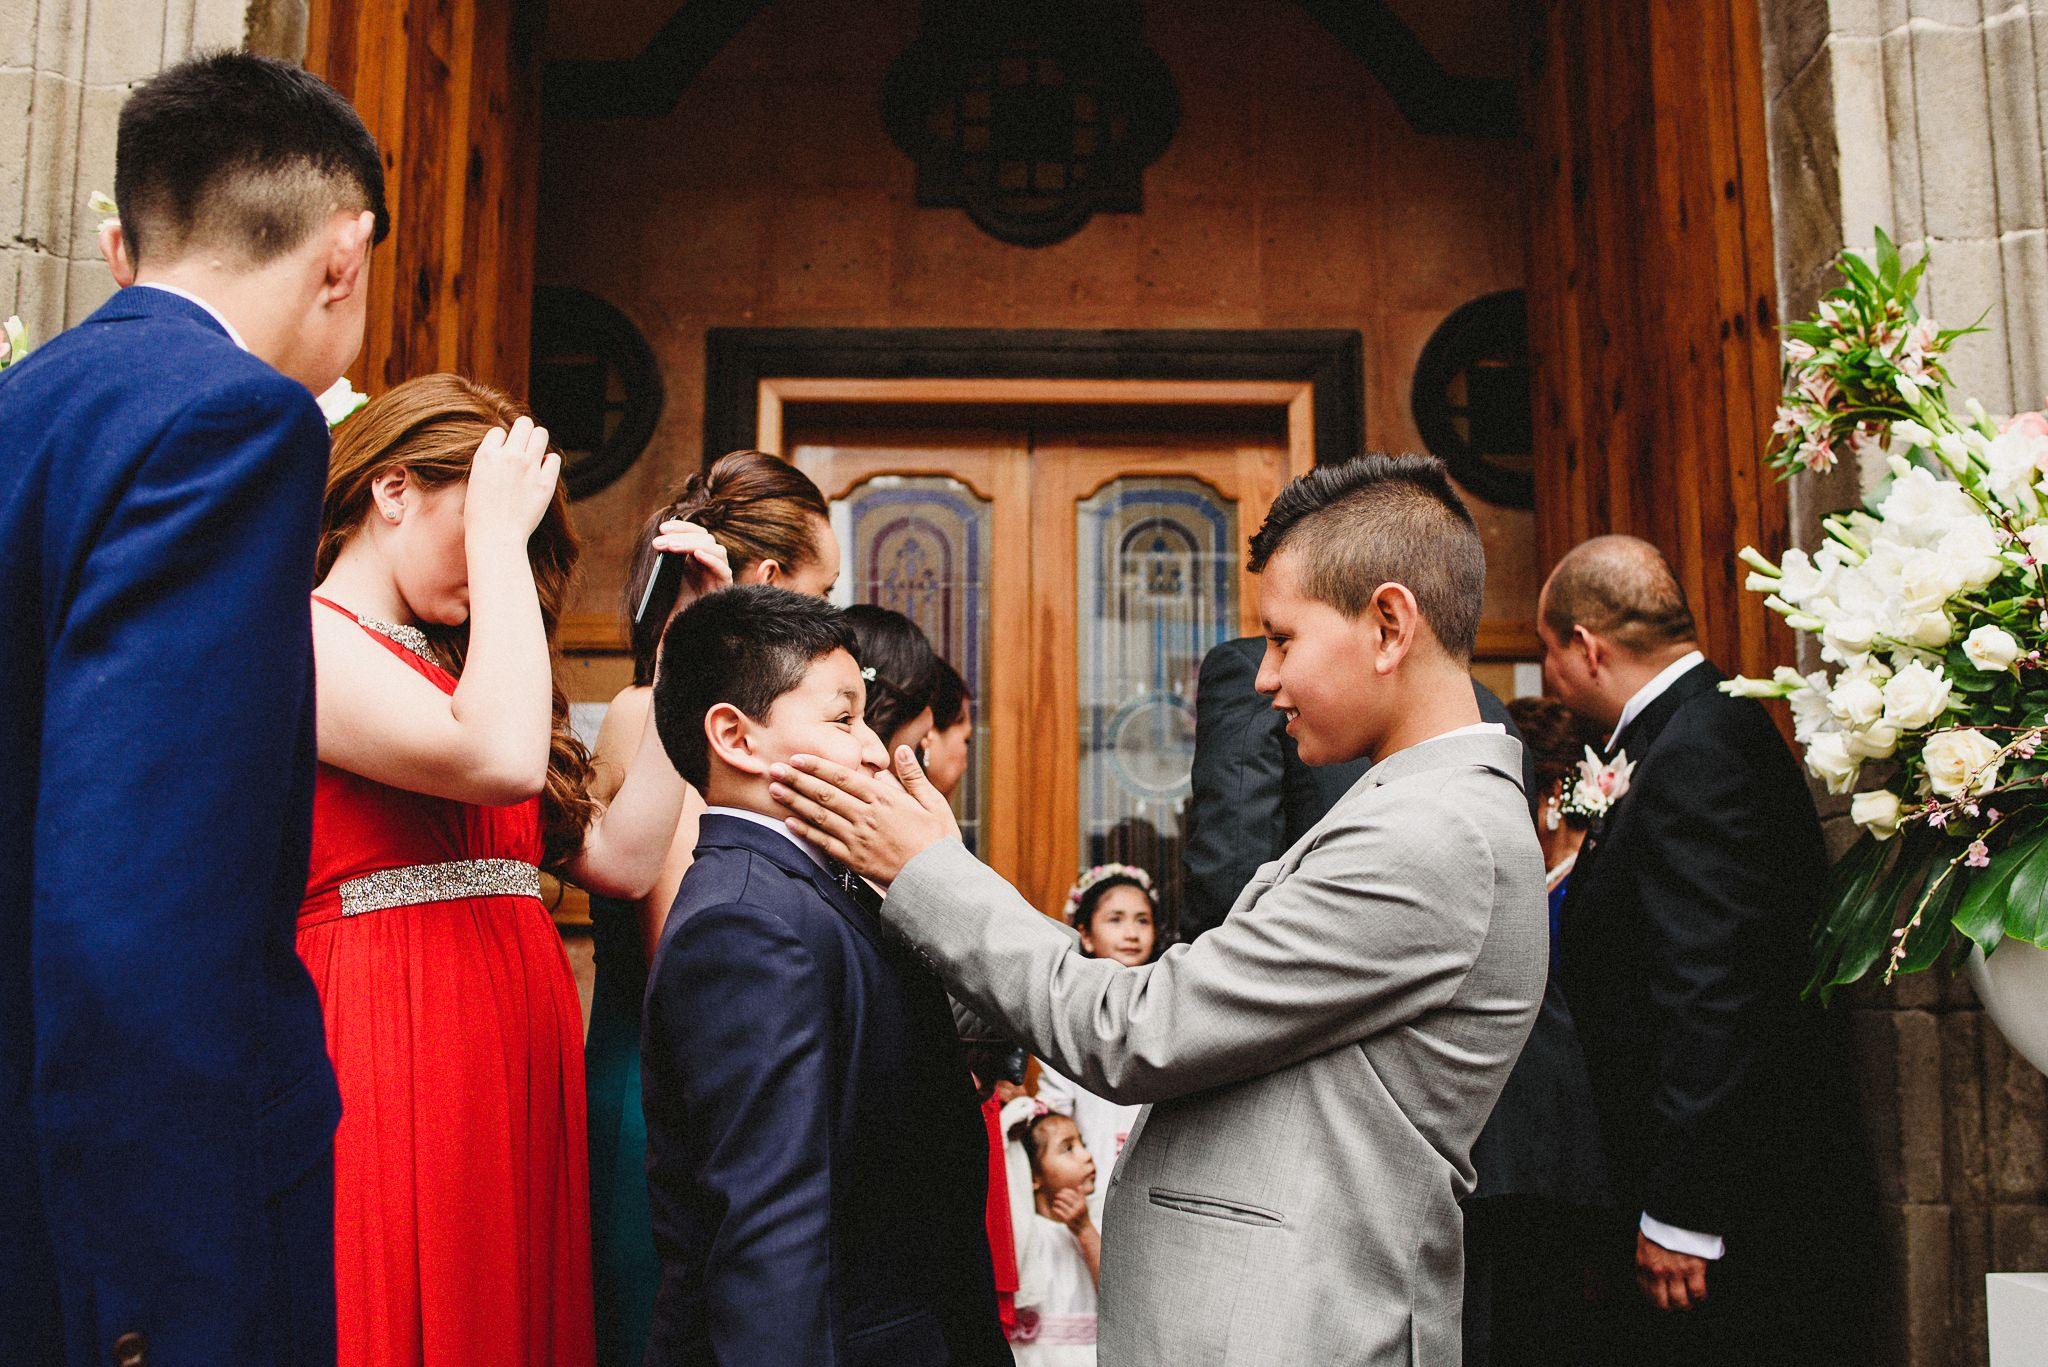 Wedding-Boda-Tulancingo-Hidalgo-Salon-Essenzia-Luis-Houdin-17-film